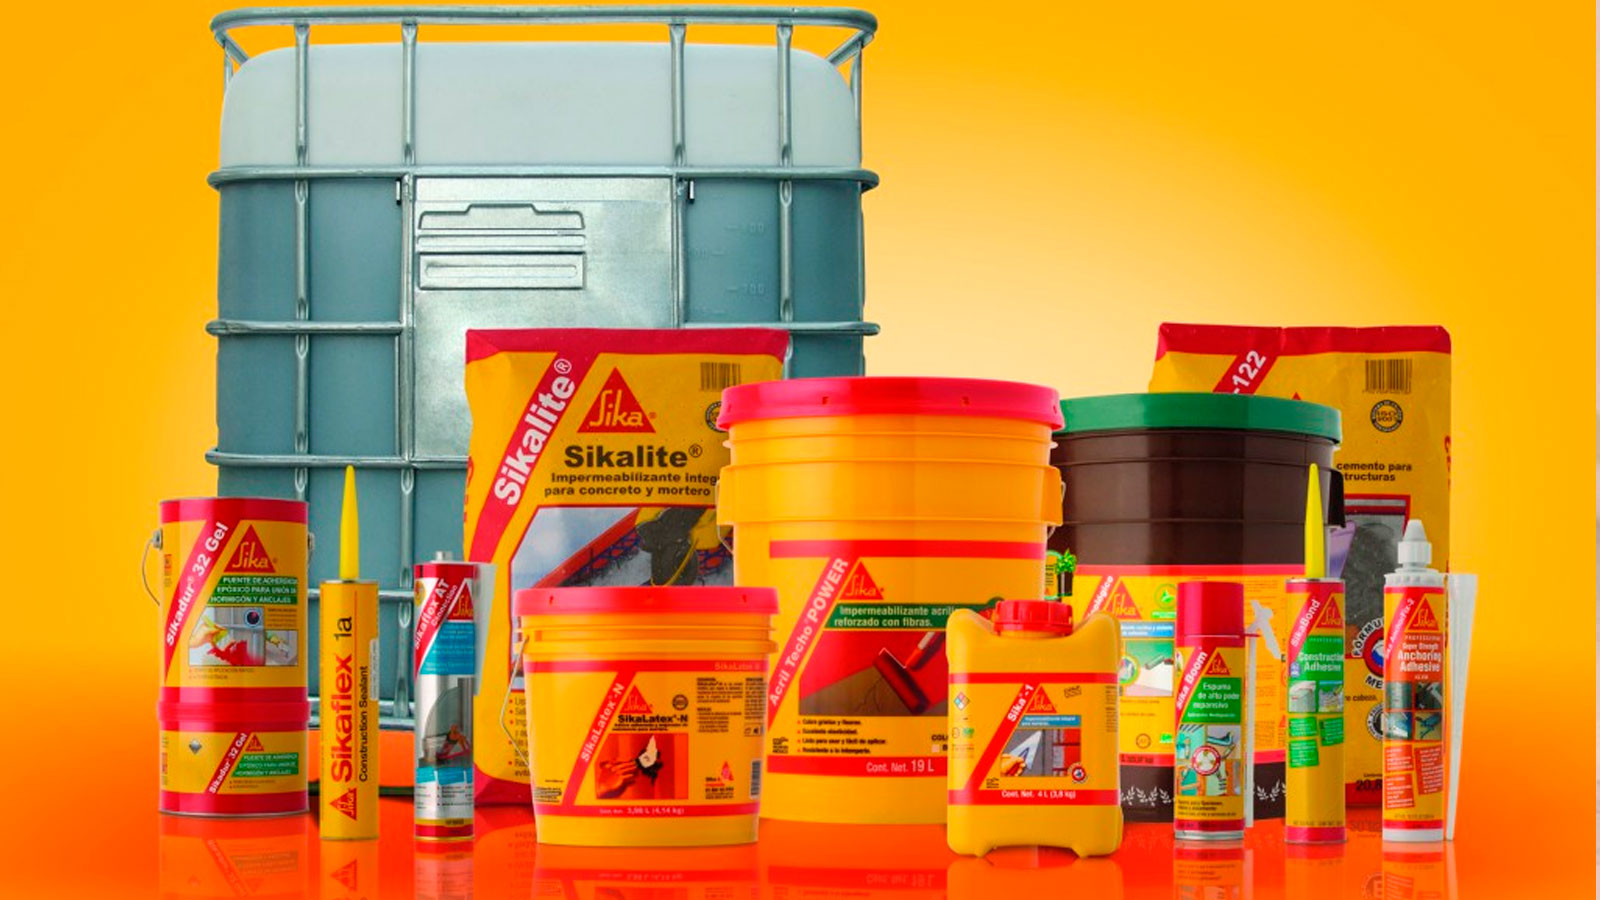 Productos sika distribuidores de sika valencia sika en for Productos sika para piscinas